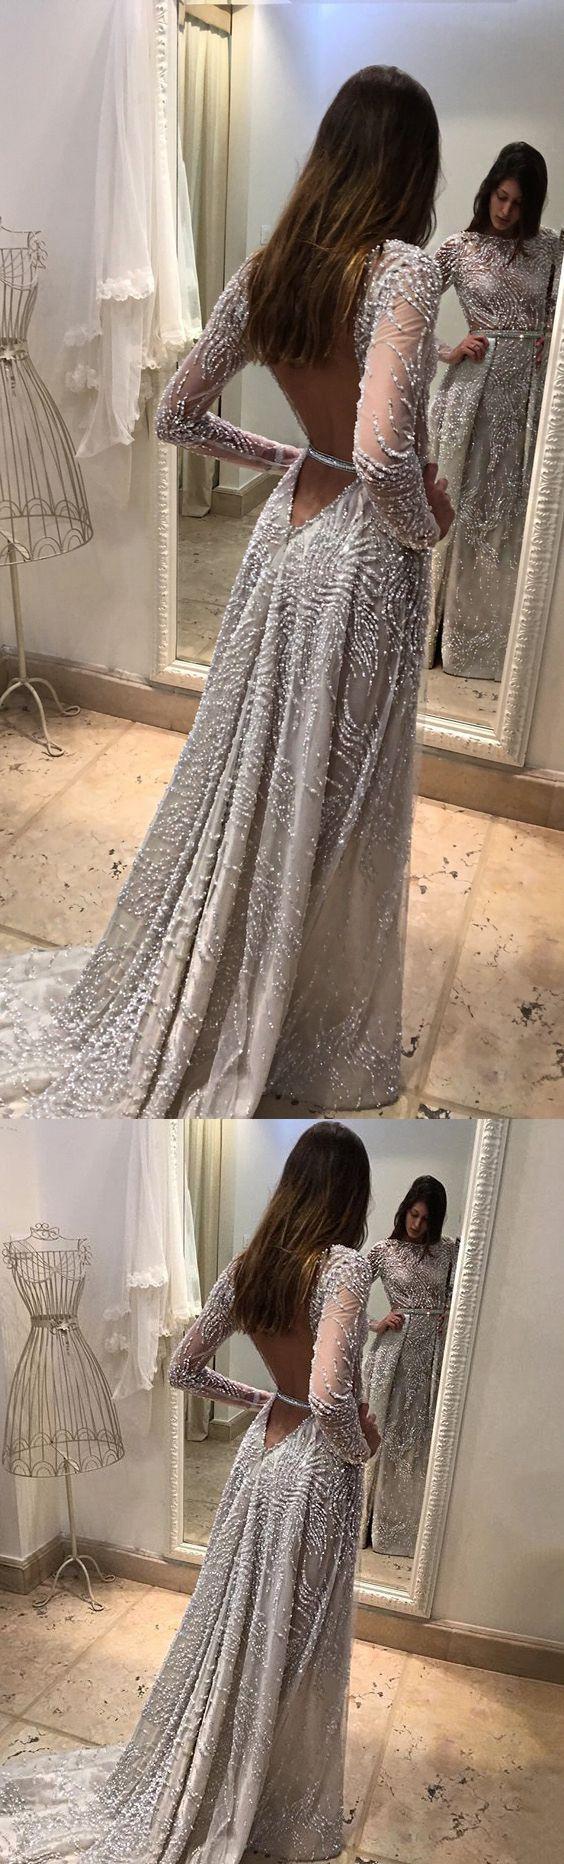 2017 Custom Made Charming Beading Prom Dress, Long Sleeves Prom Dress,Backless Prom Dress,See Through Prom Dress